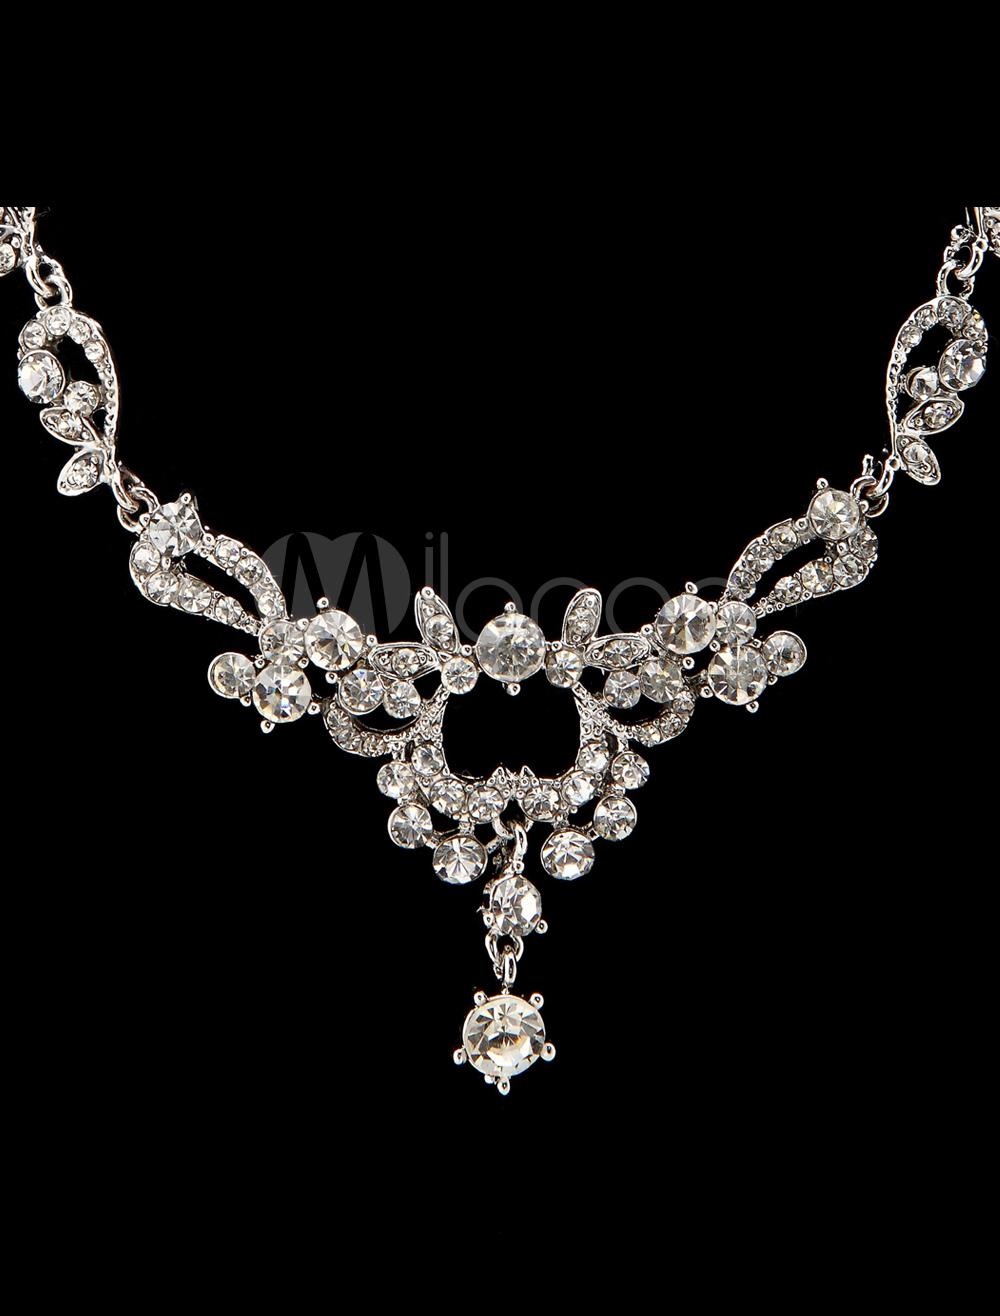 silver metal rhinestone jewelry set for wedding